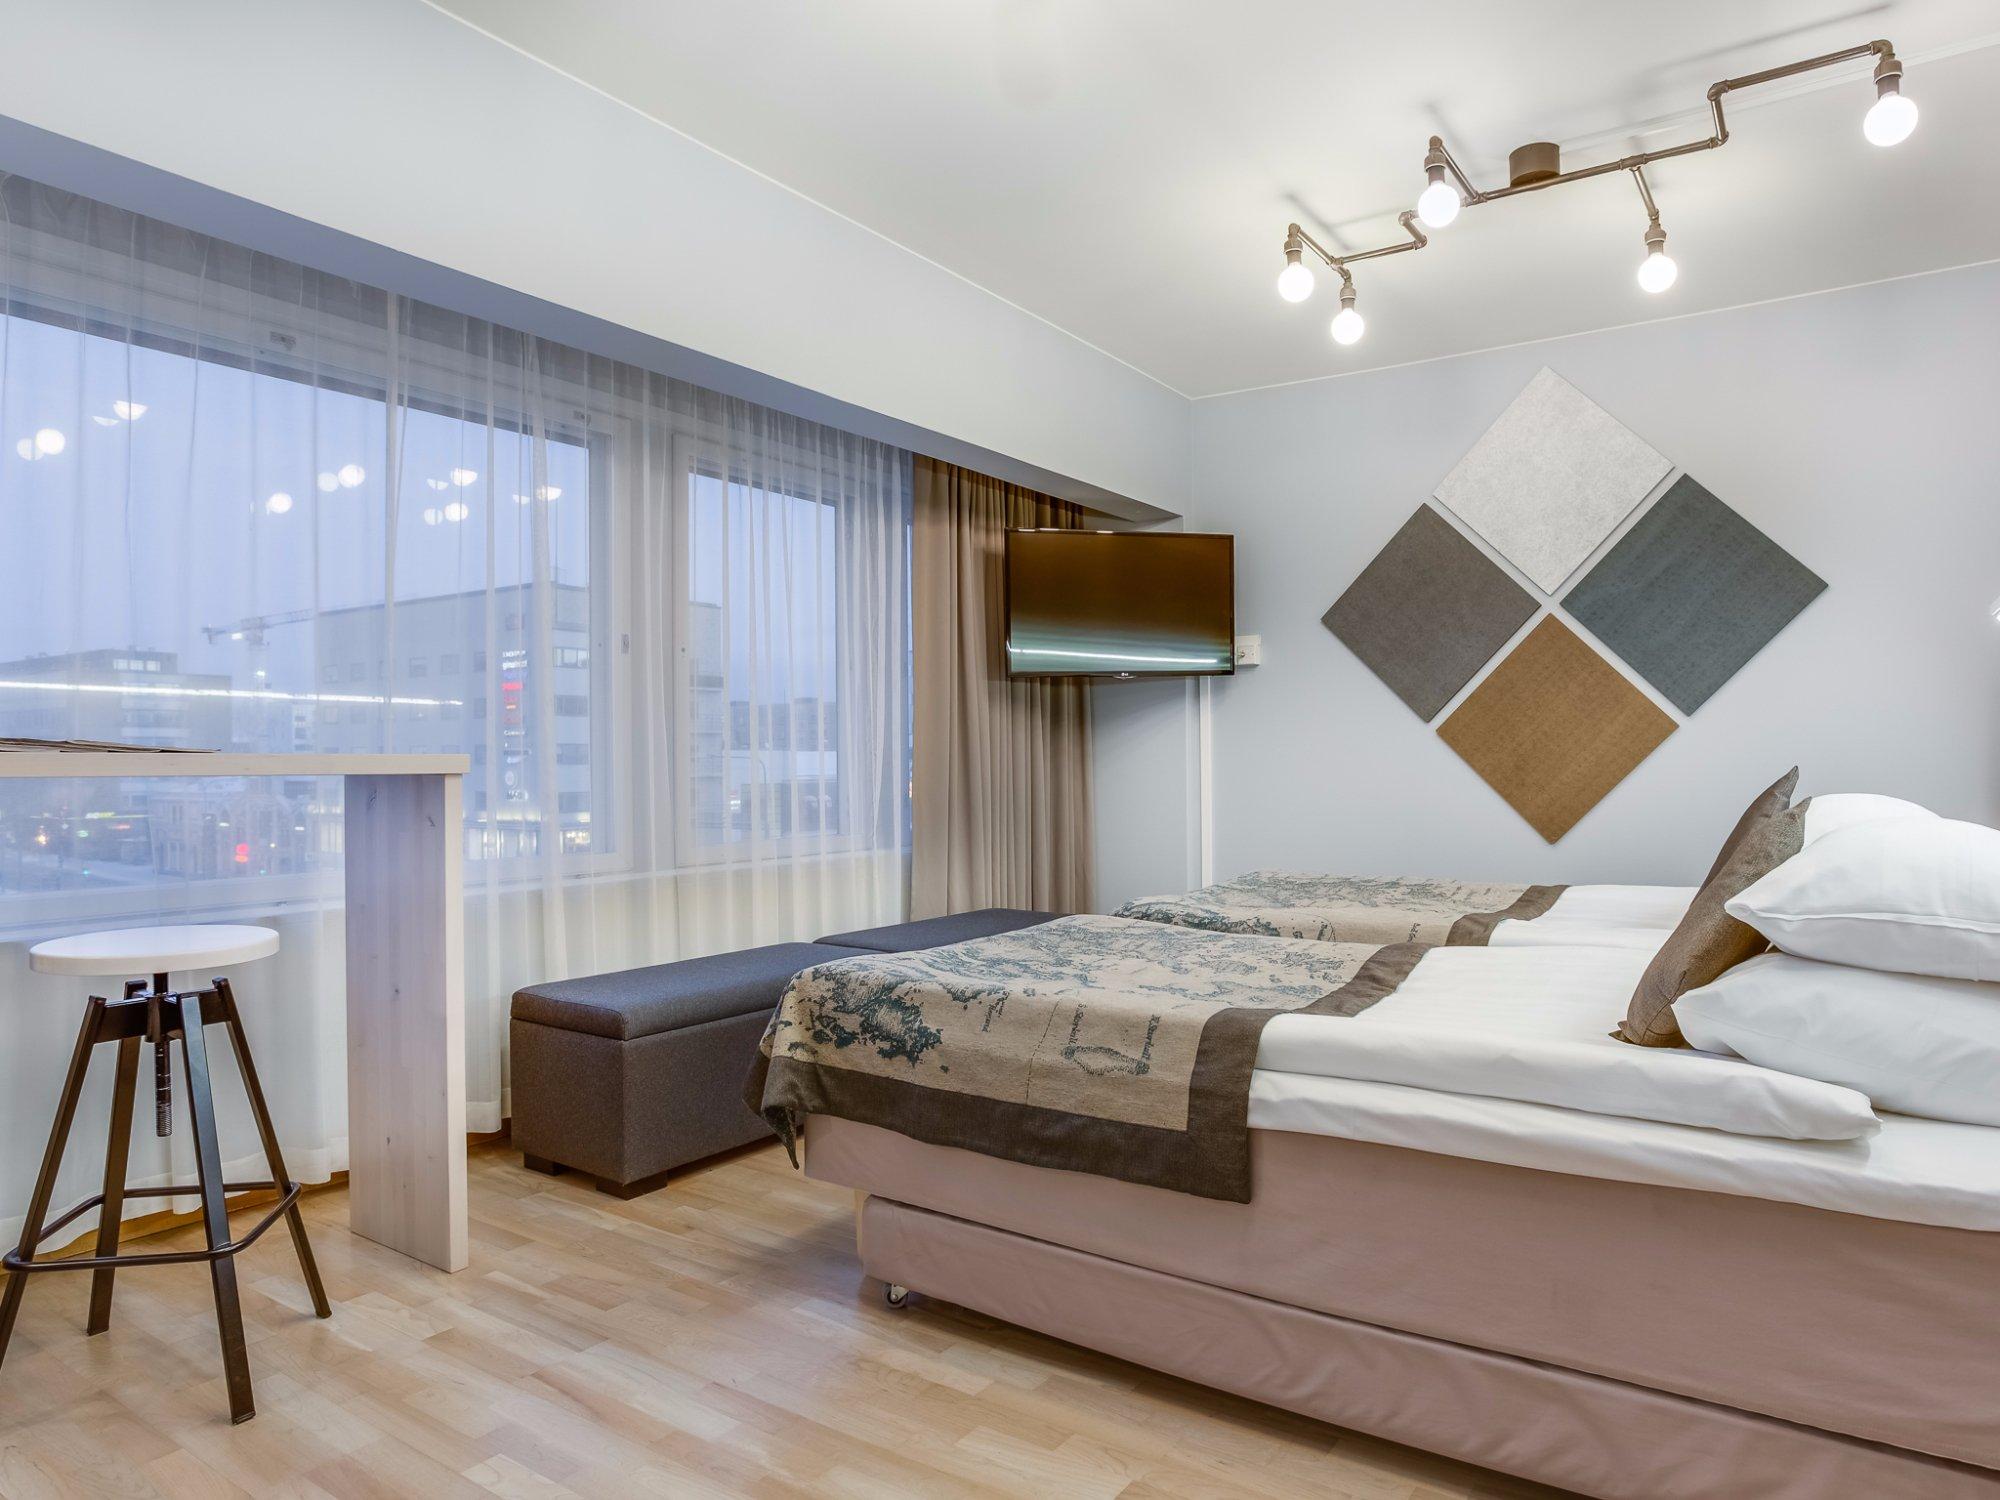 original sokos hotel ilves Vantaa